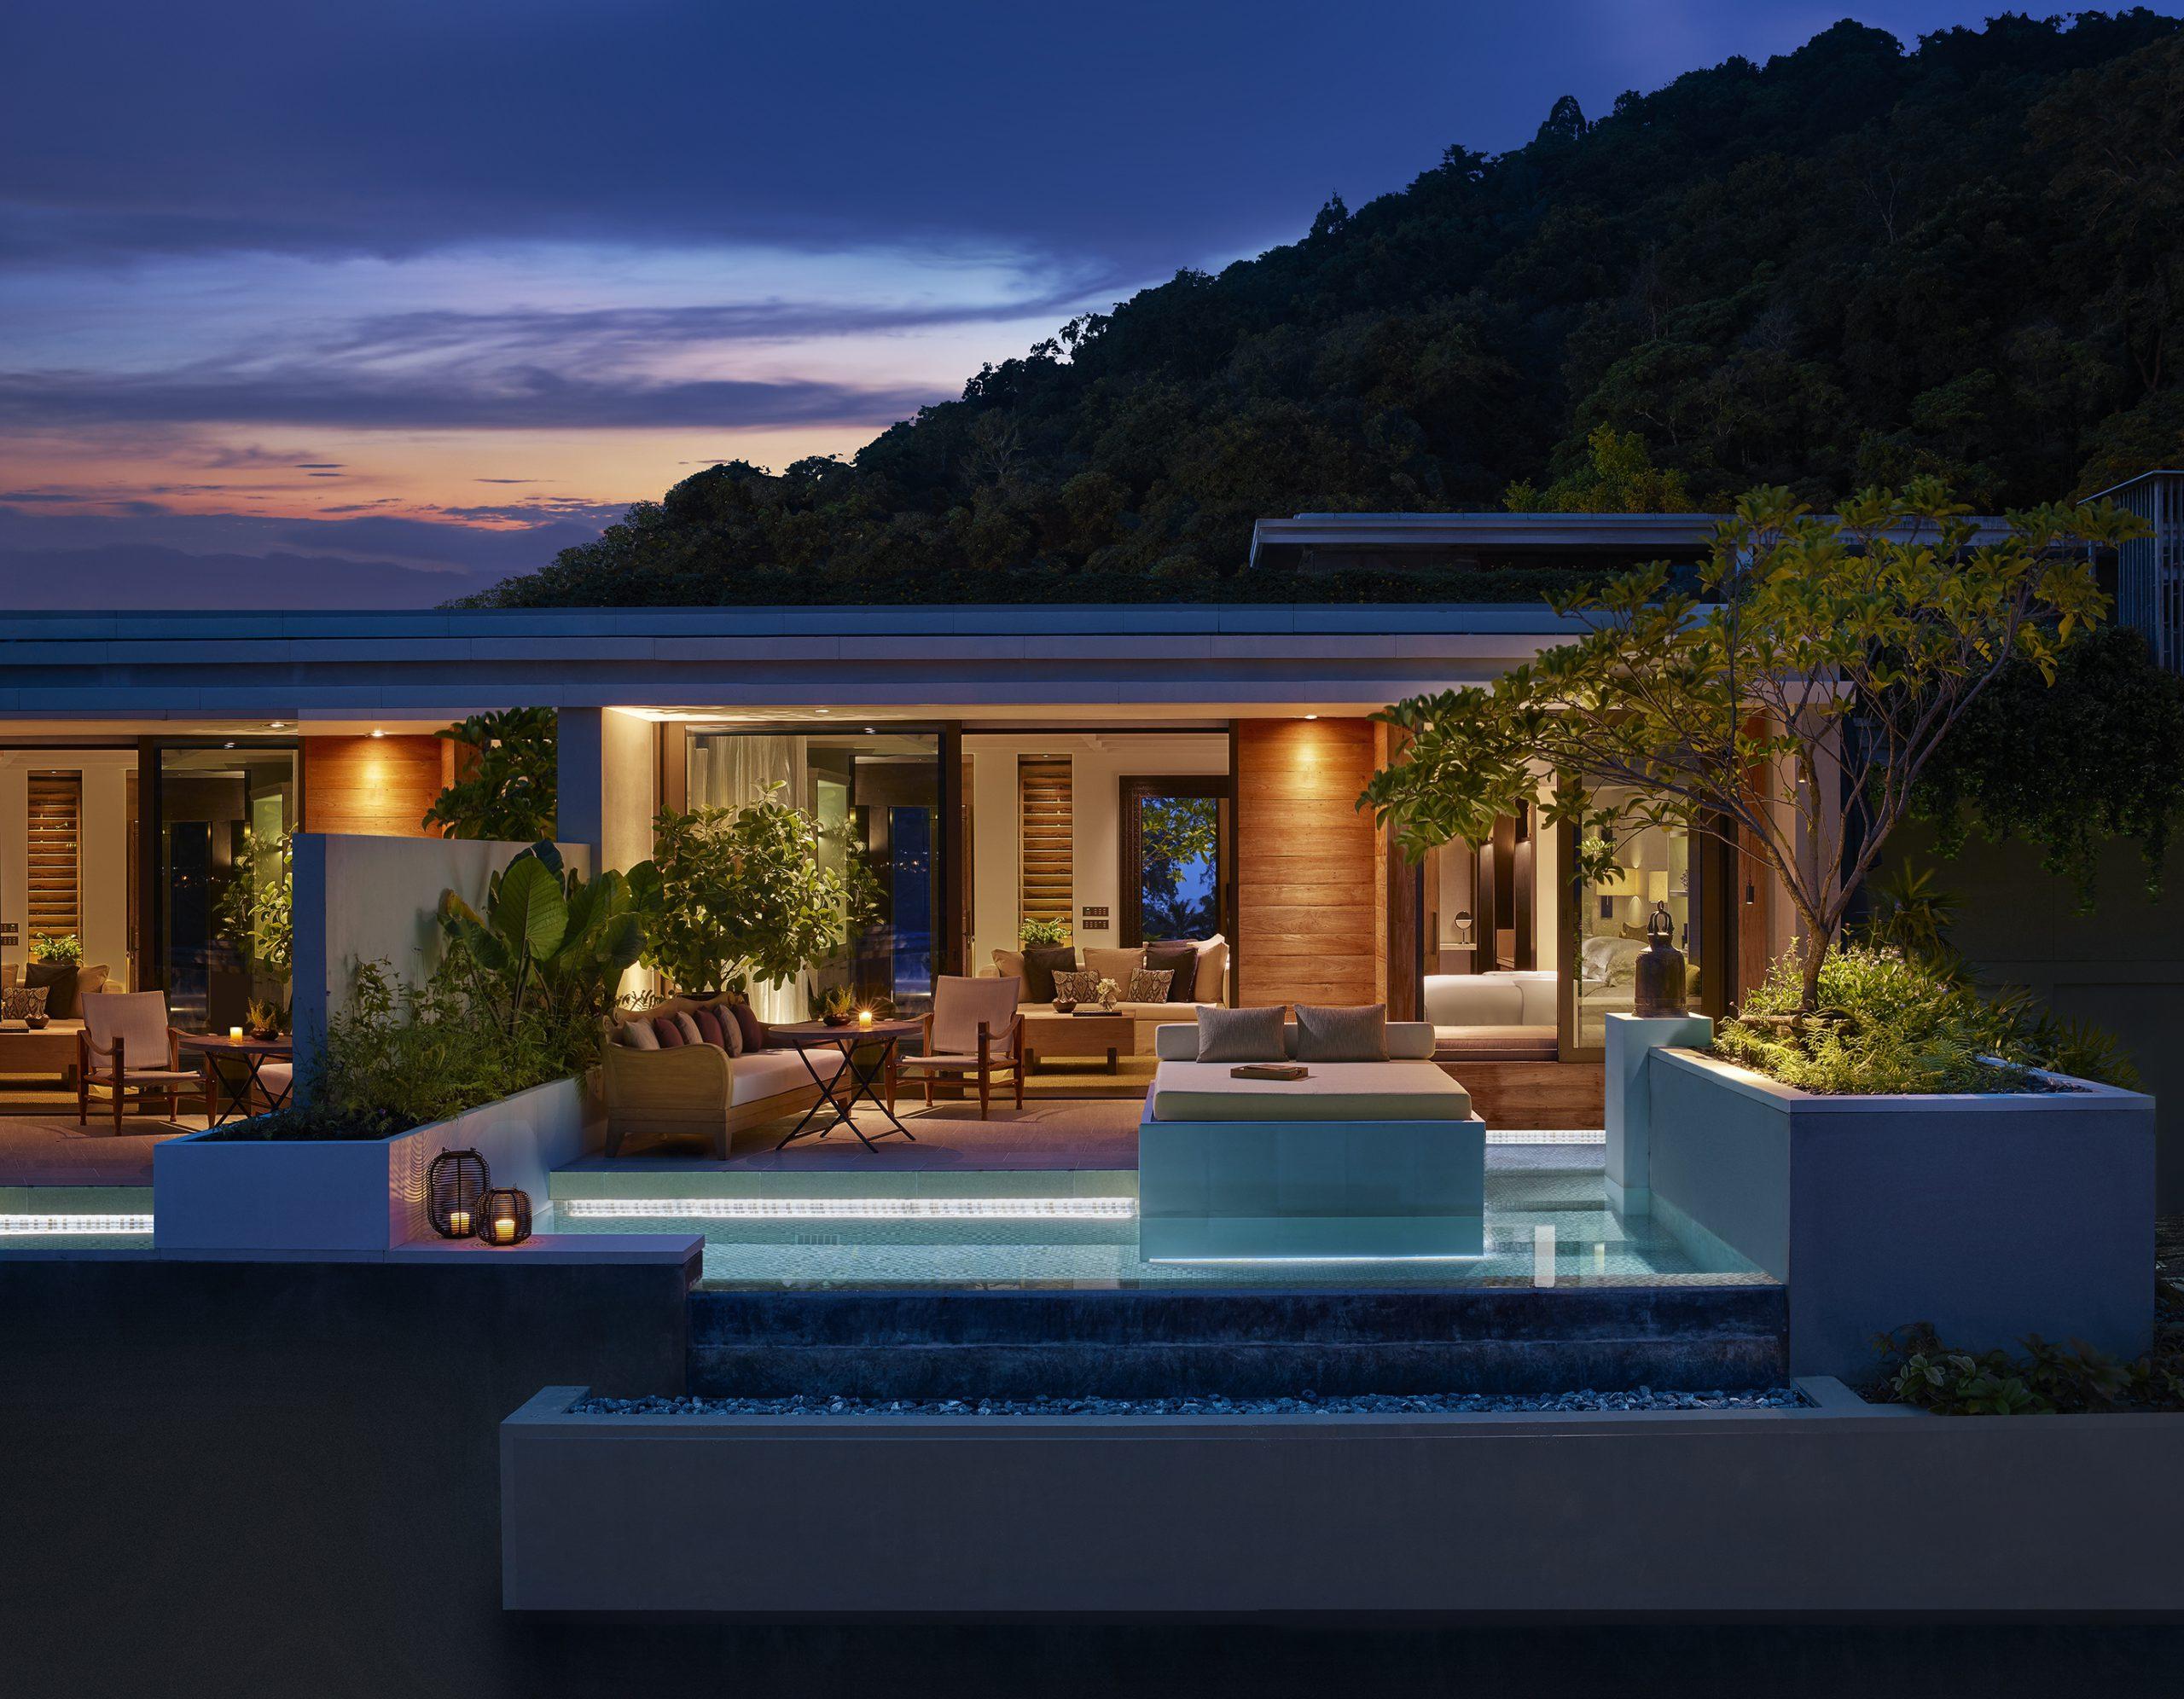 S06 Rosewood Phuket